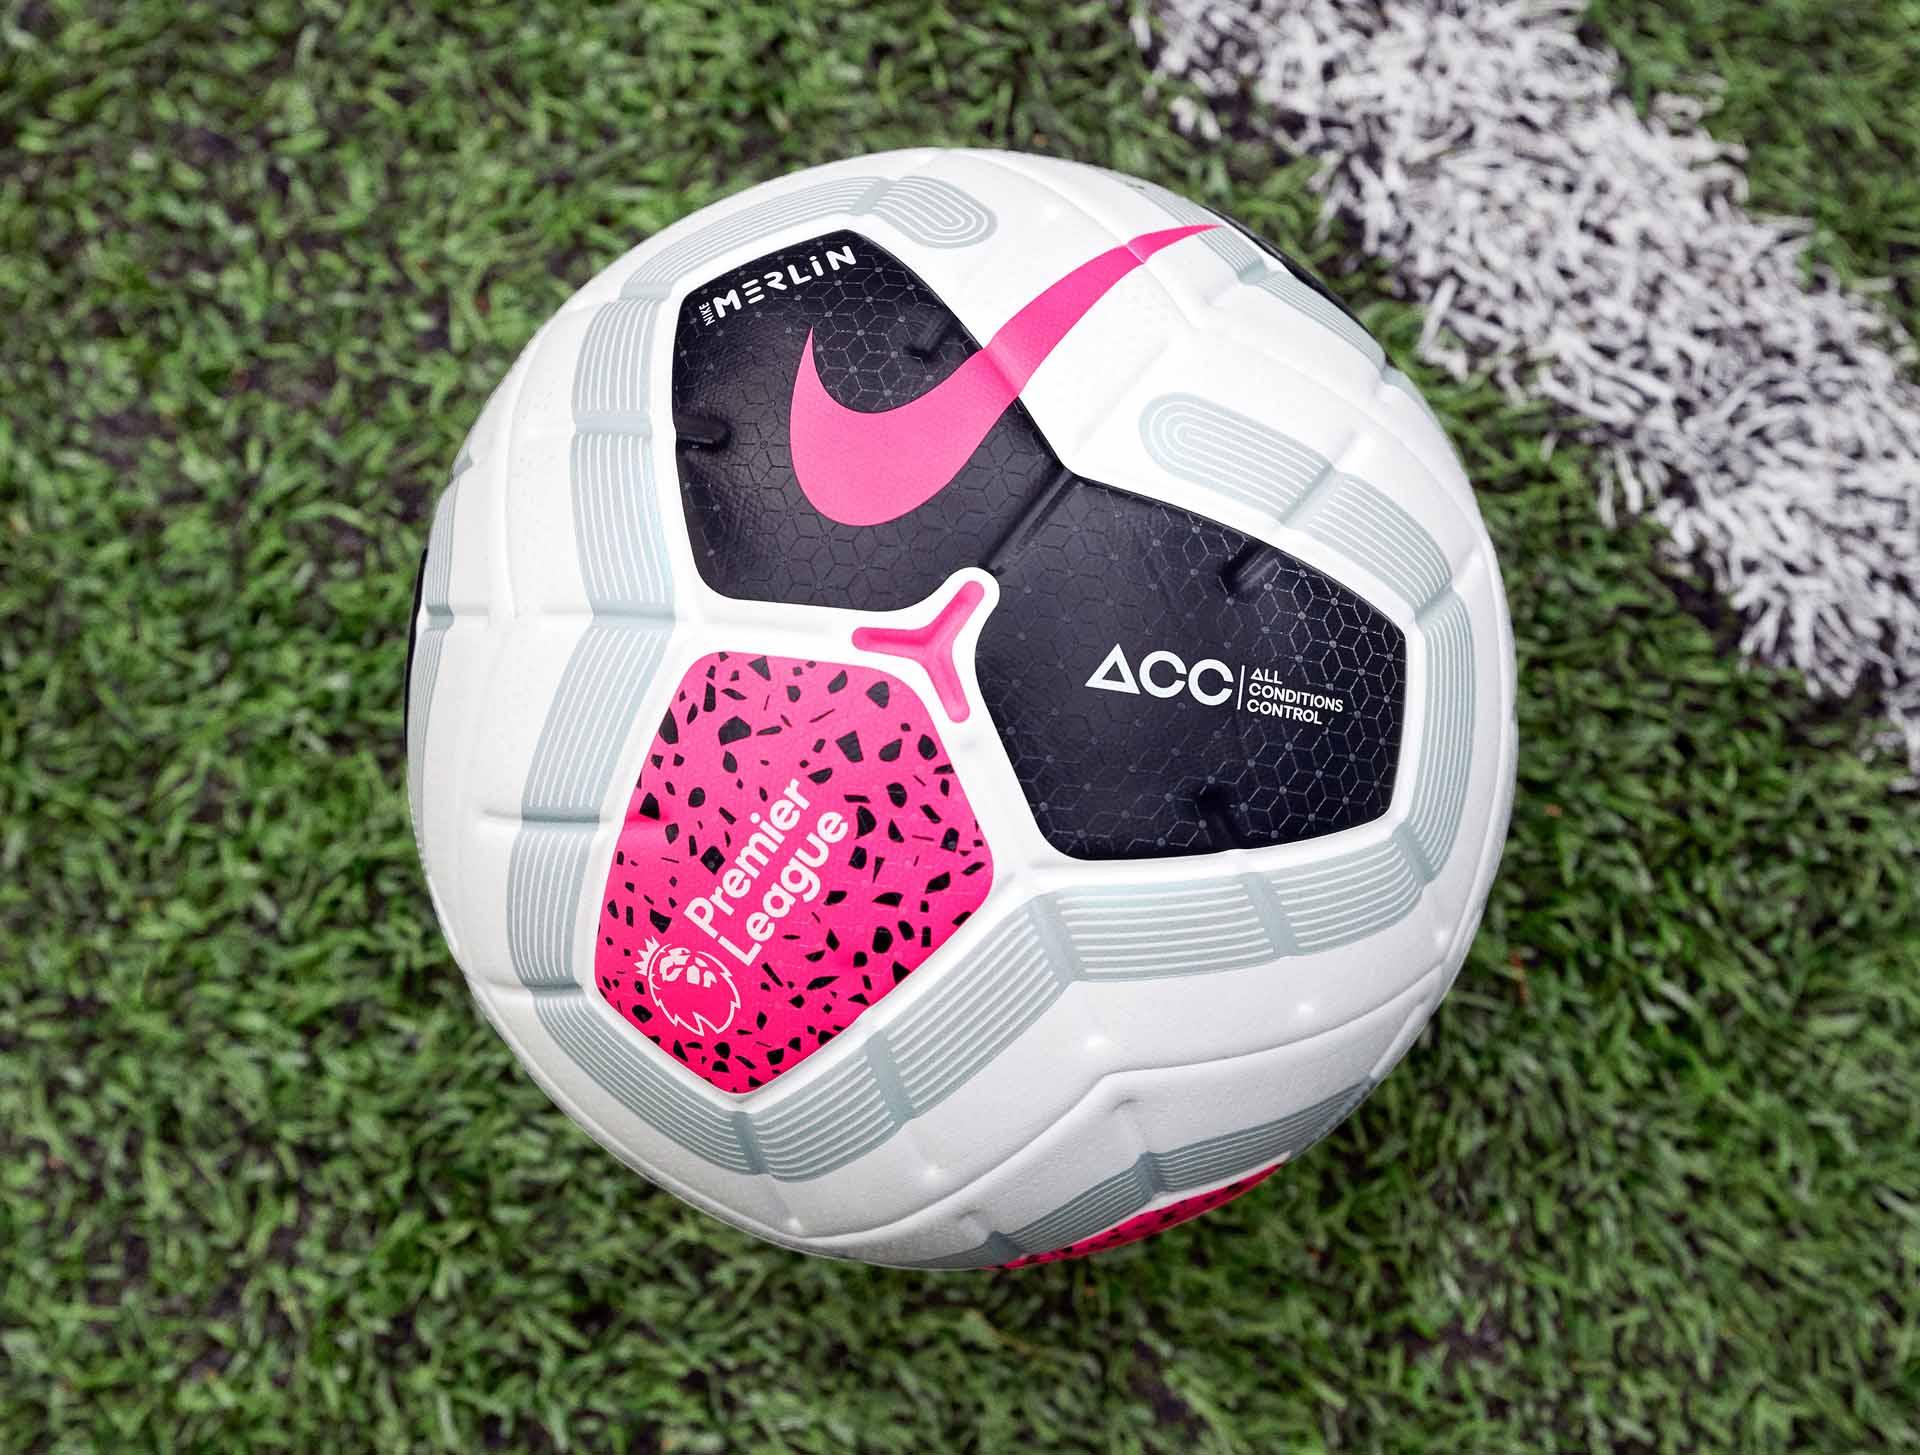 Nike Merlin 2019-20 Premier League Futbolo Kamuolys